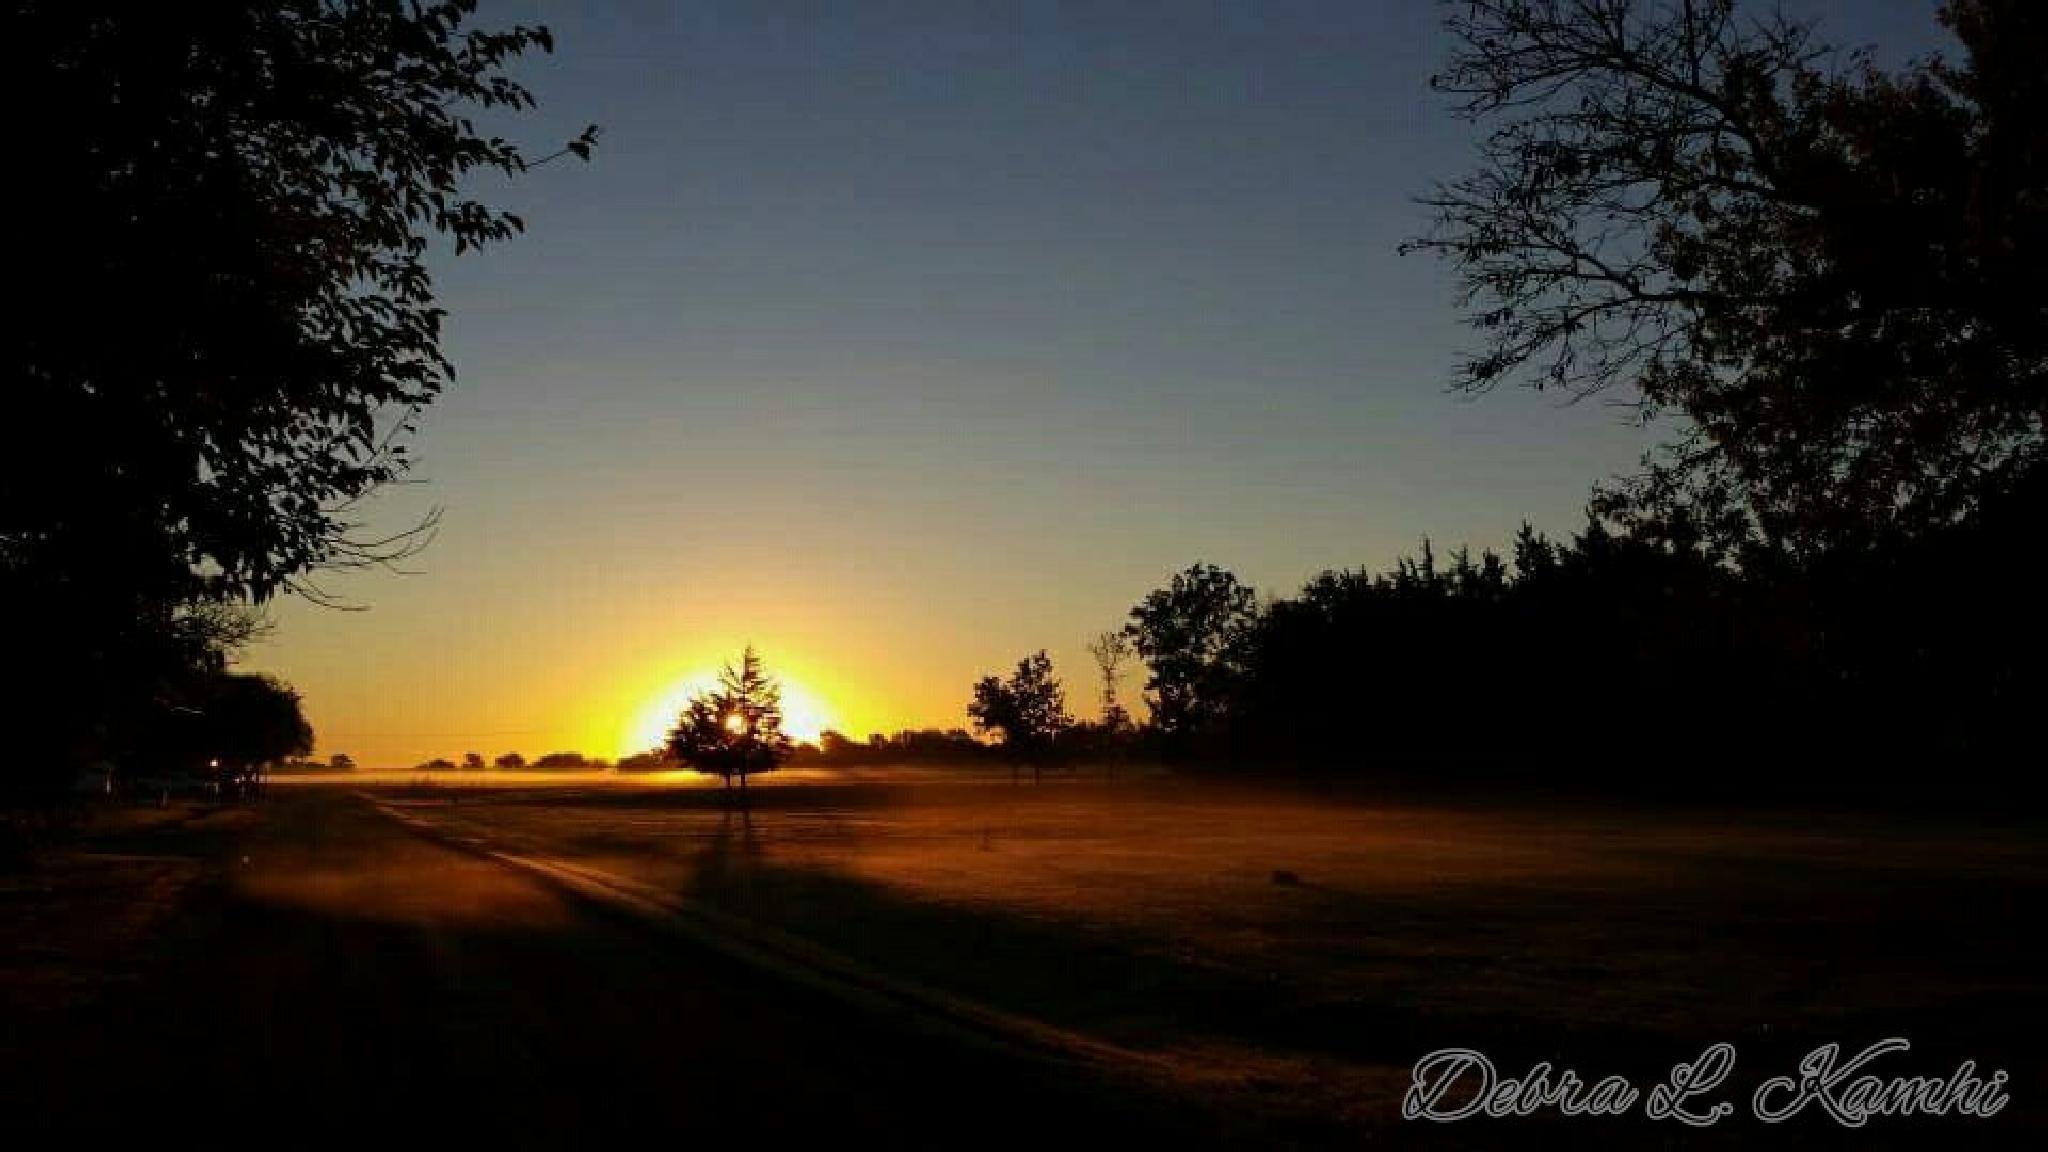 Dirt Road Sunrise by debra.kamhi